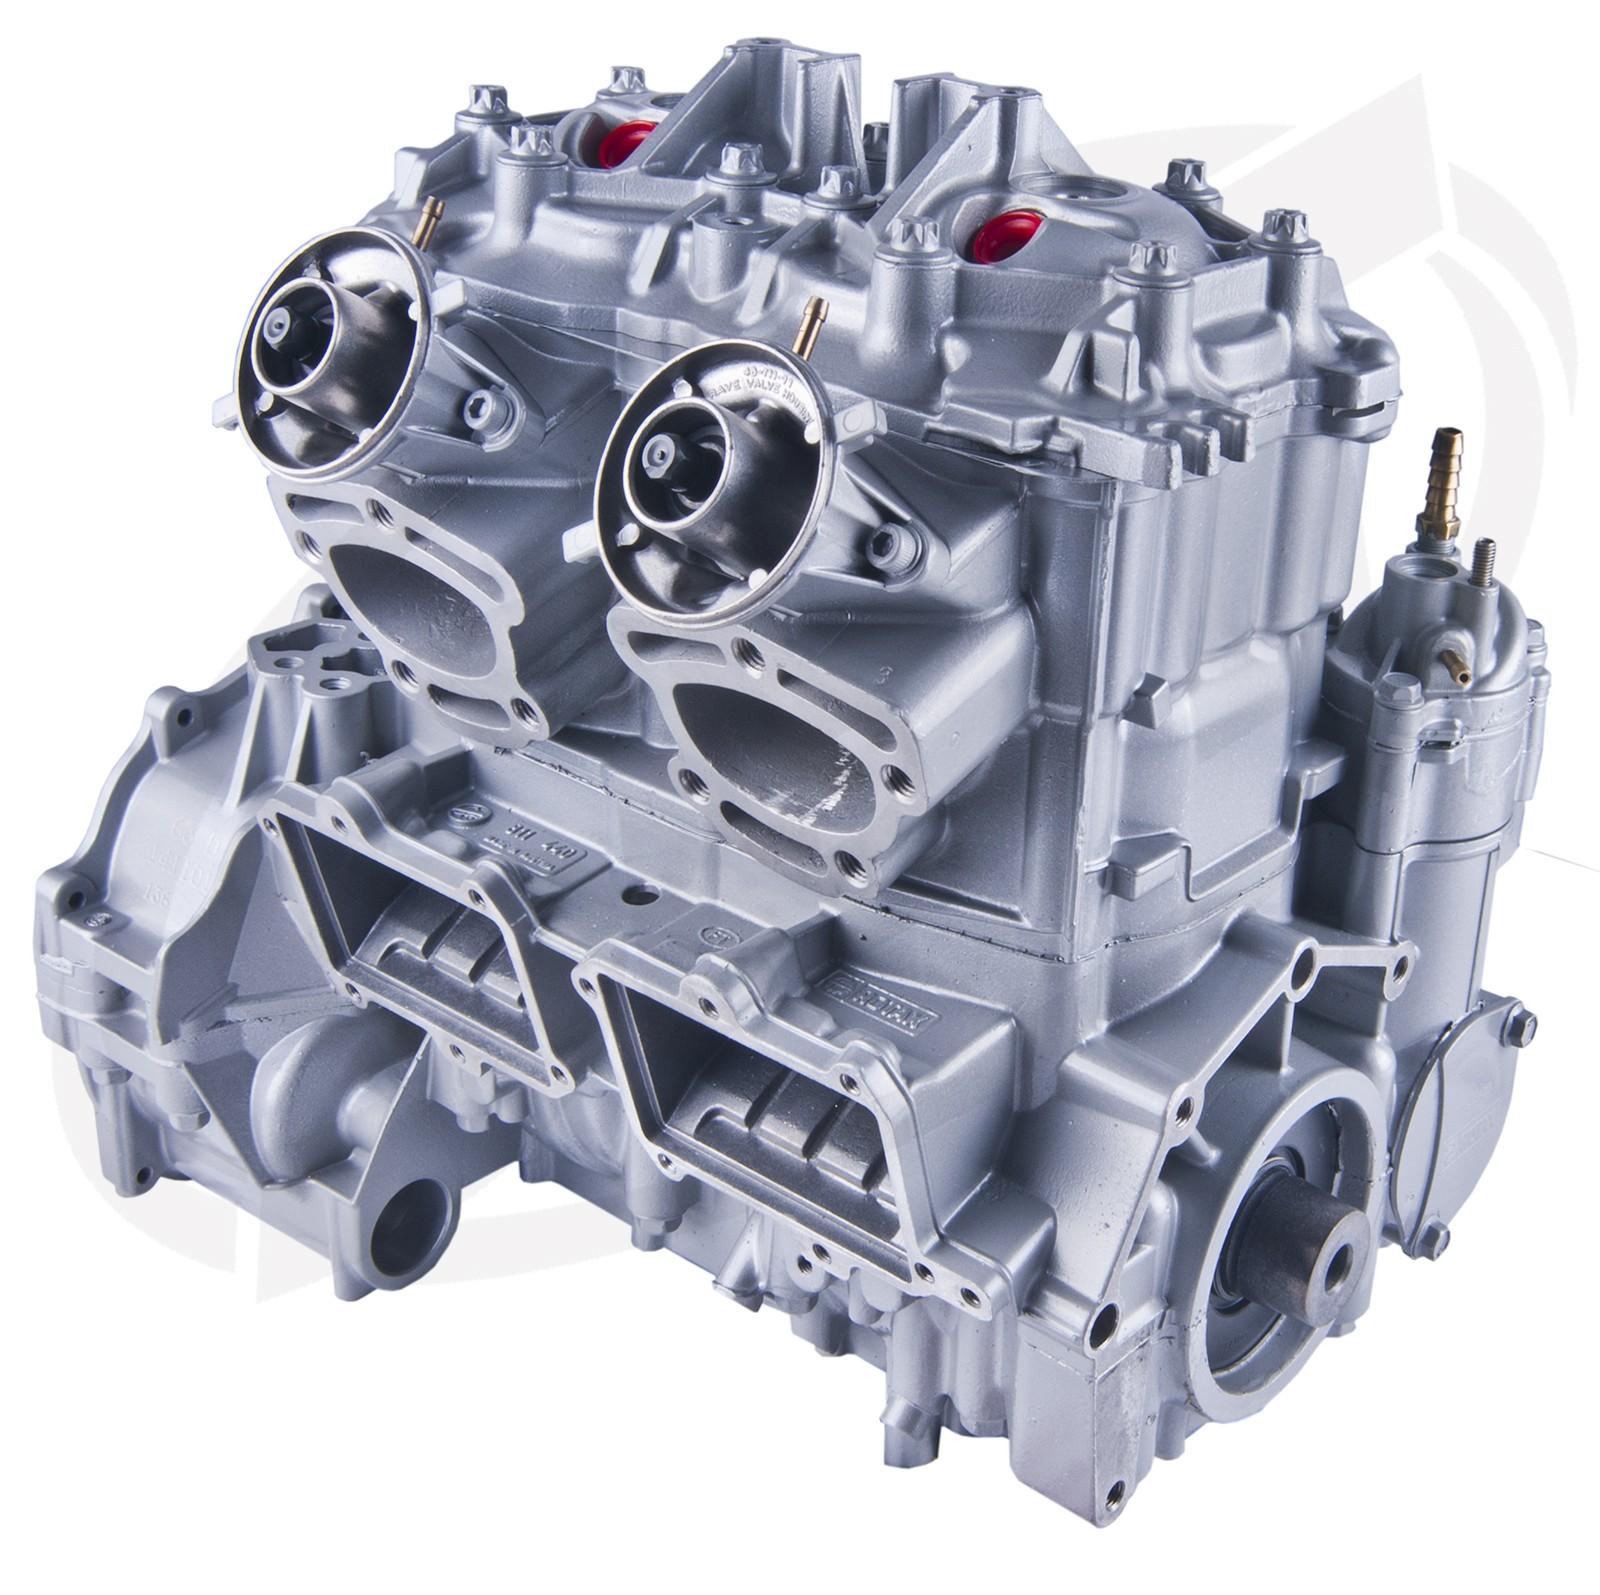 2002 Seadoo    Gtx    Di    Engine       Diagram      My Wiring    DIagram